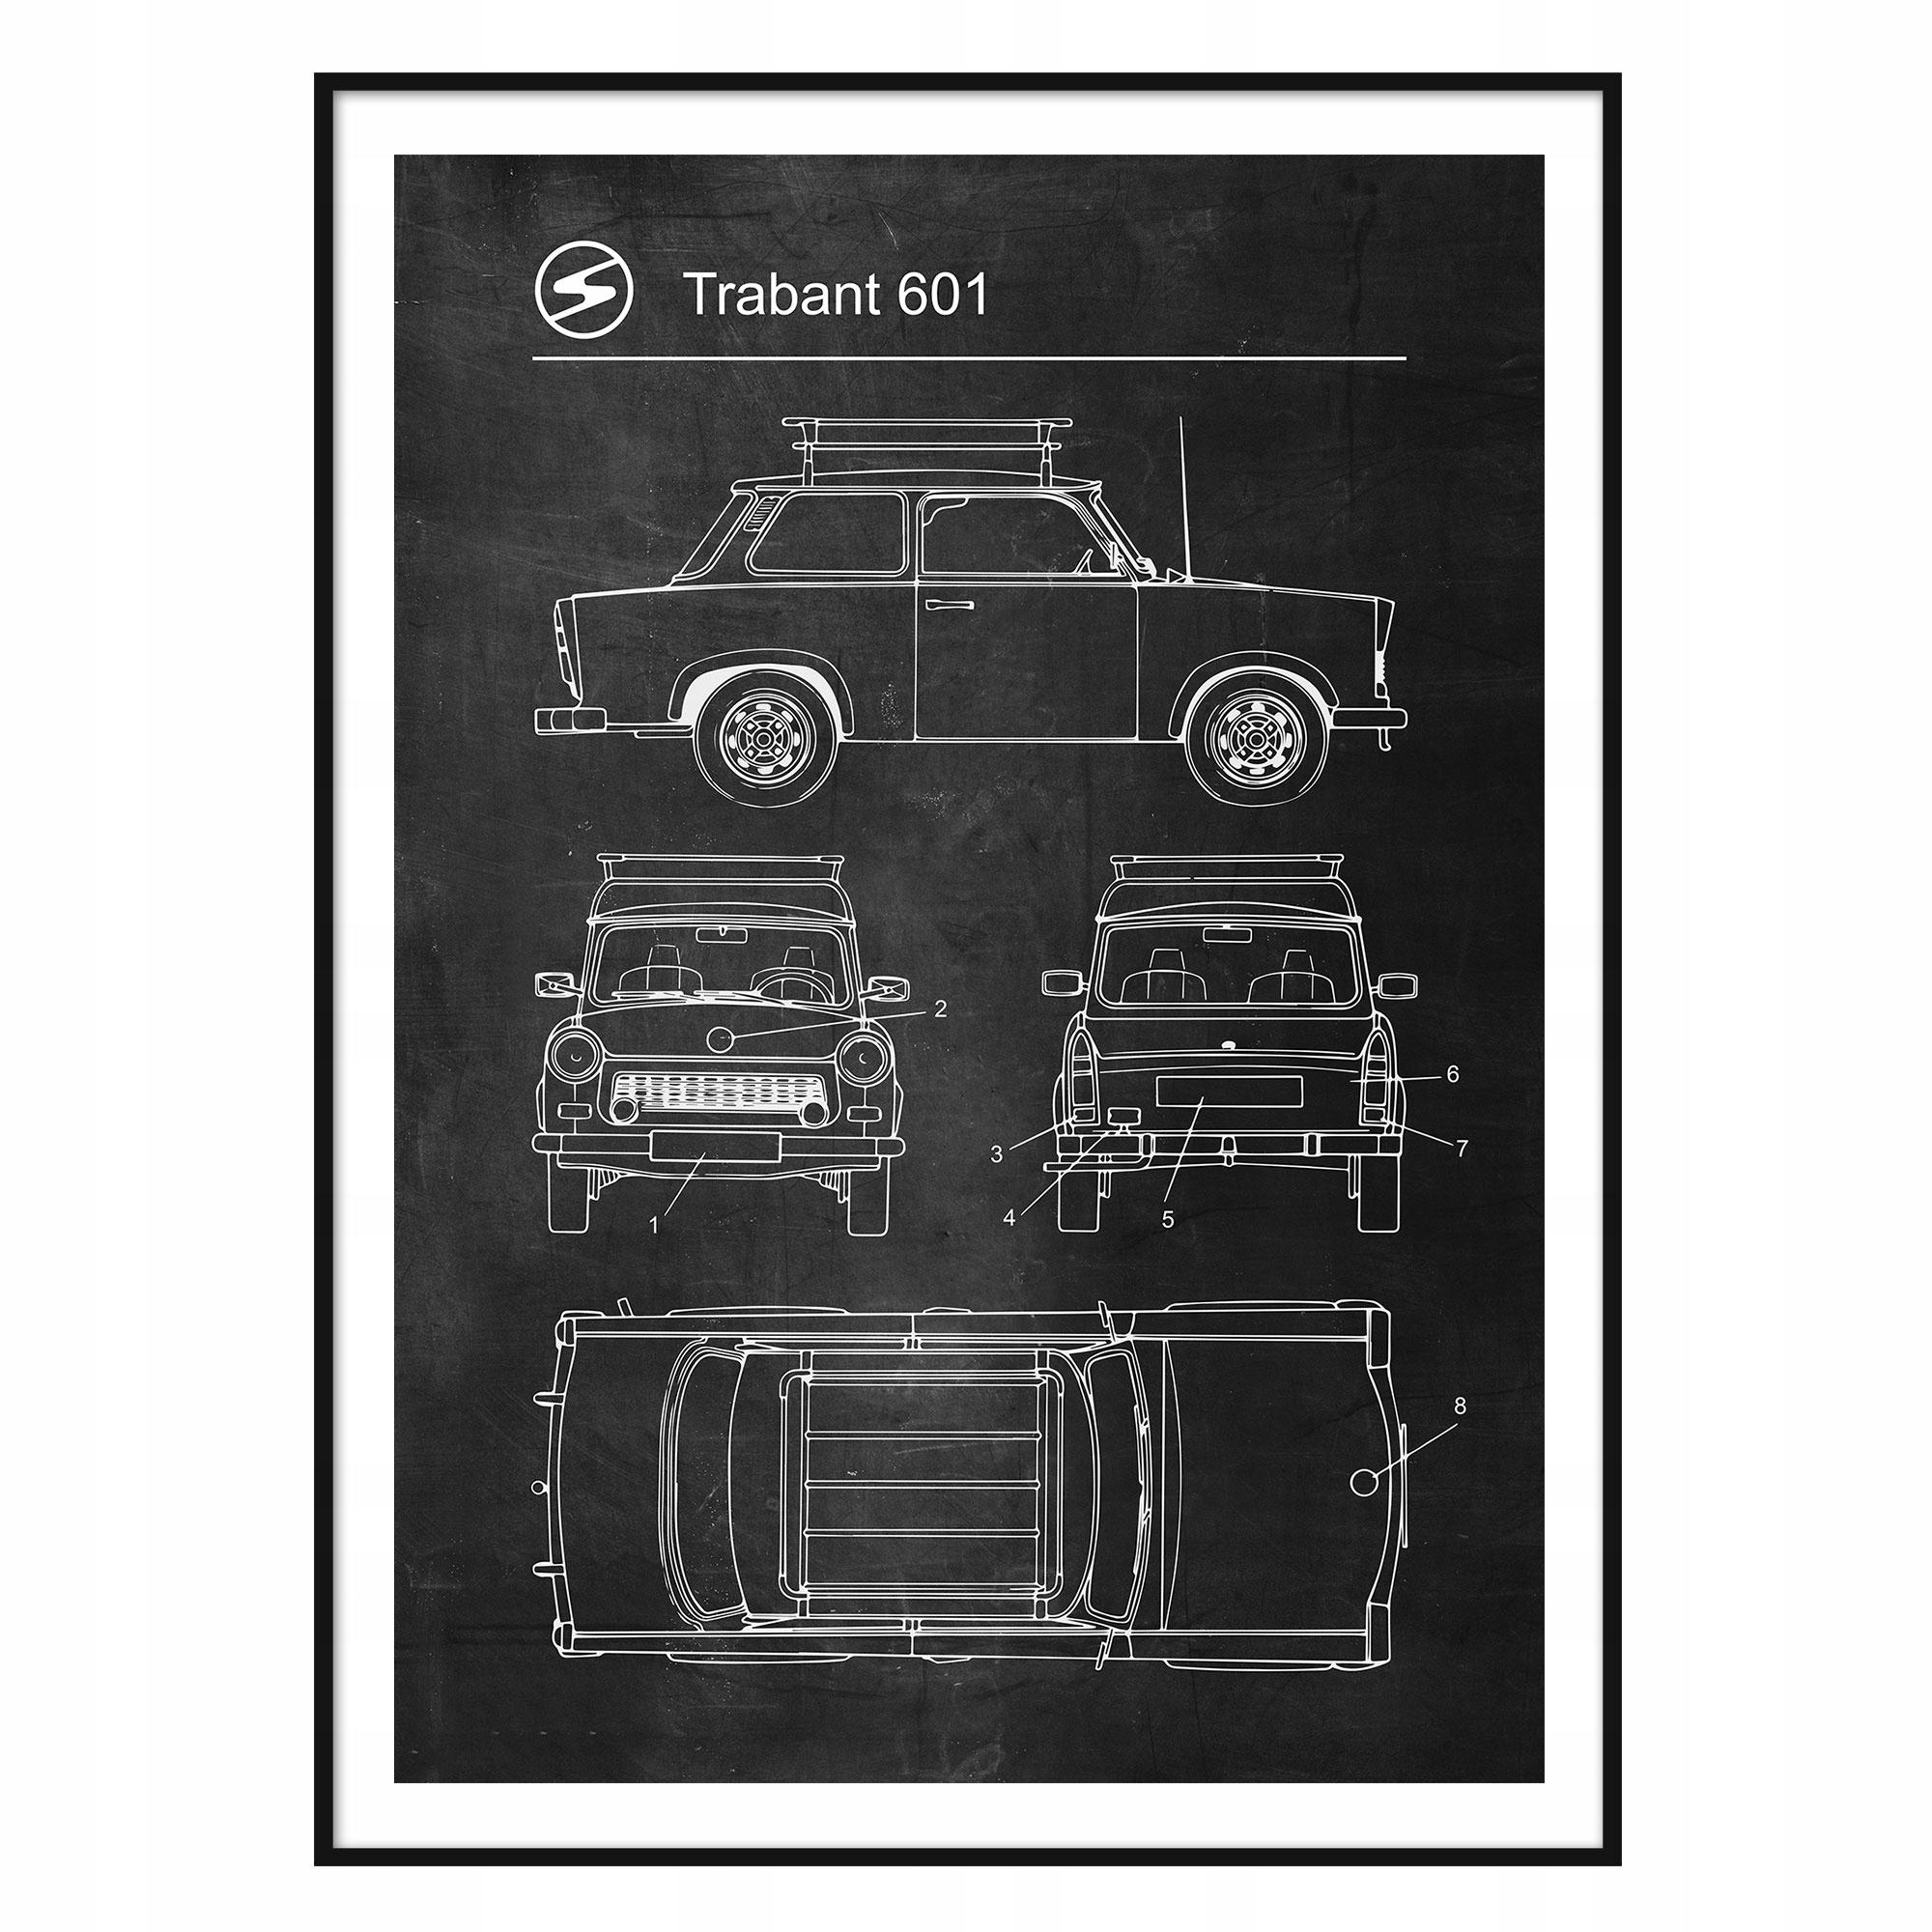 Retro patentový plagát Trabant 601